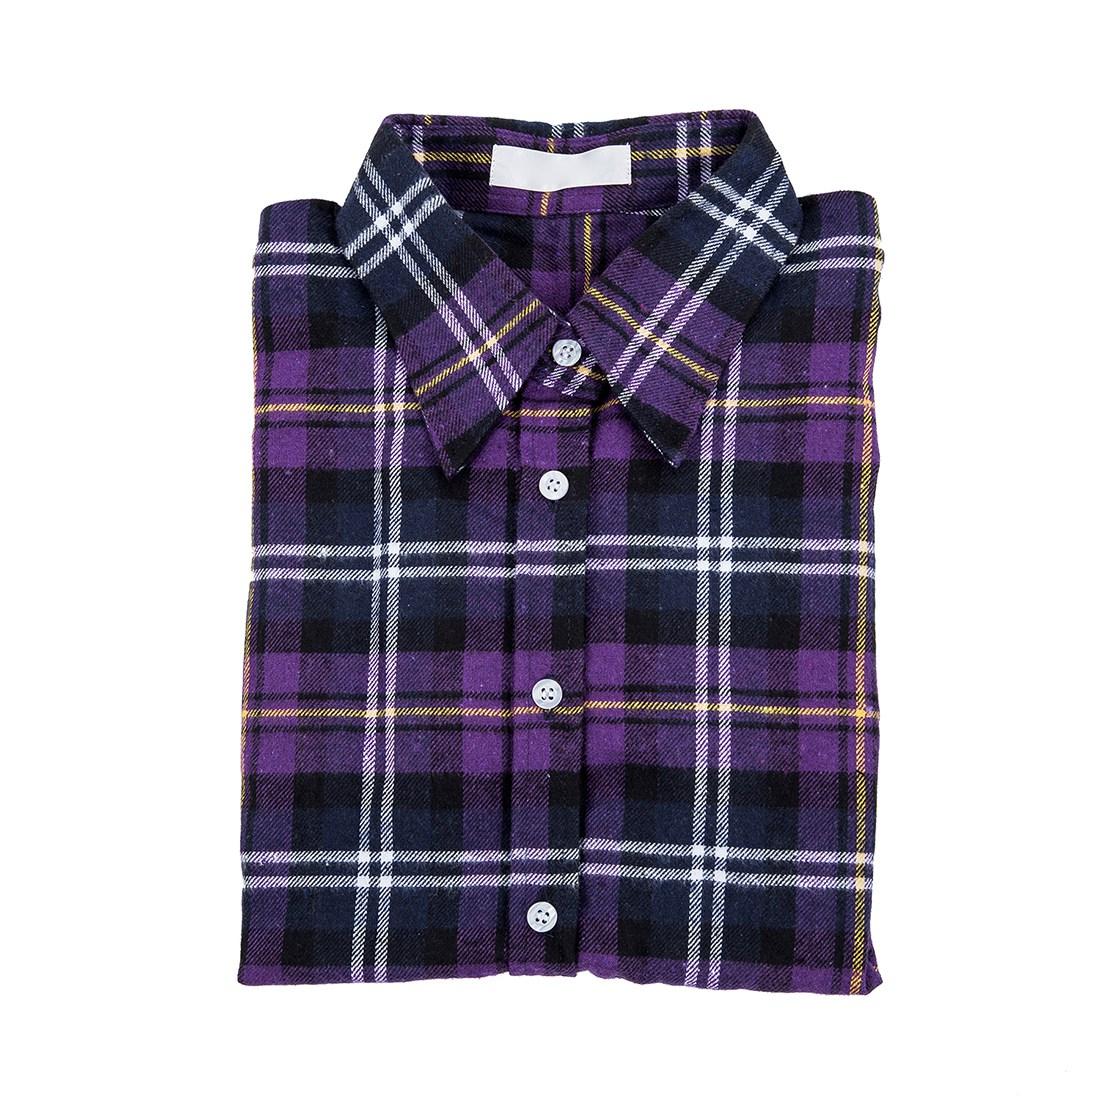 Womens shirt flannel shirts tops blouse purple white m for White and black flannel shirt womens